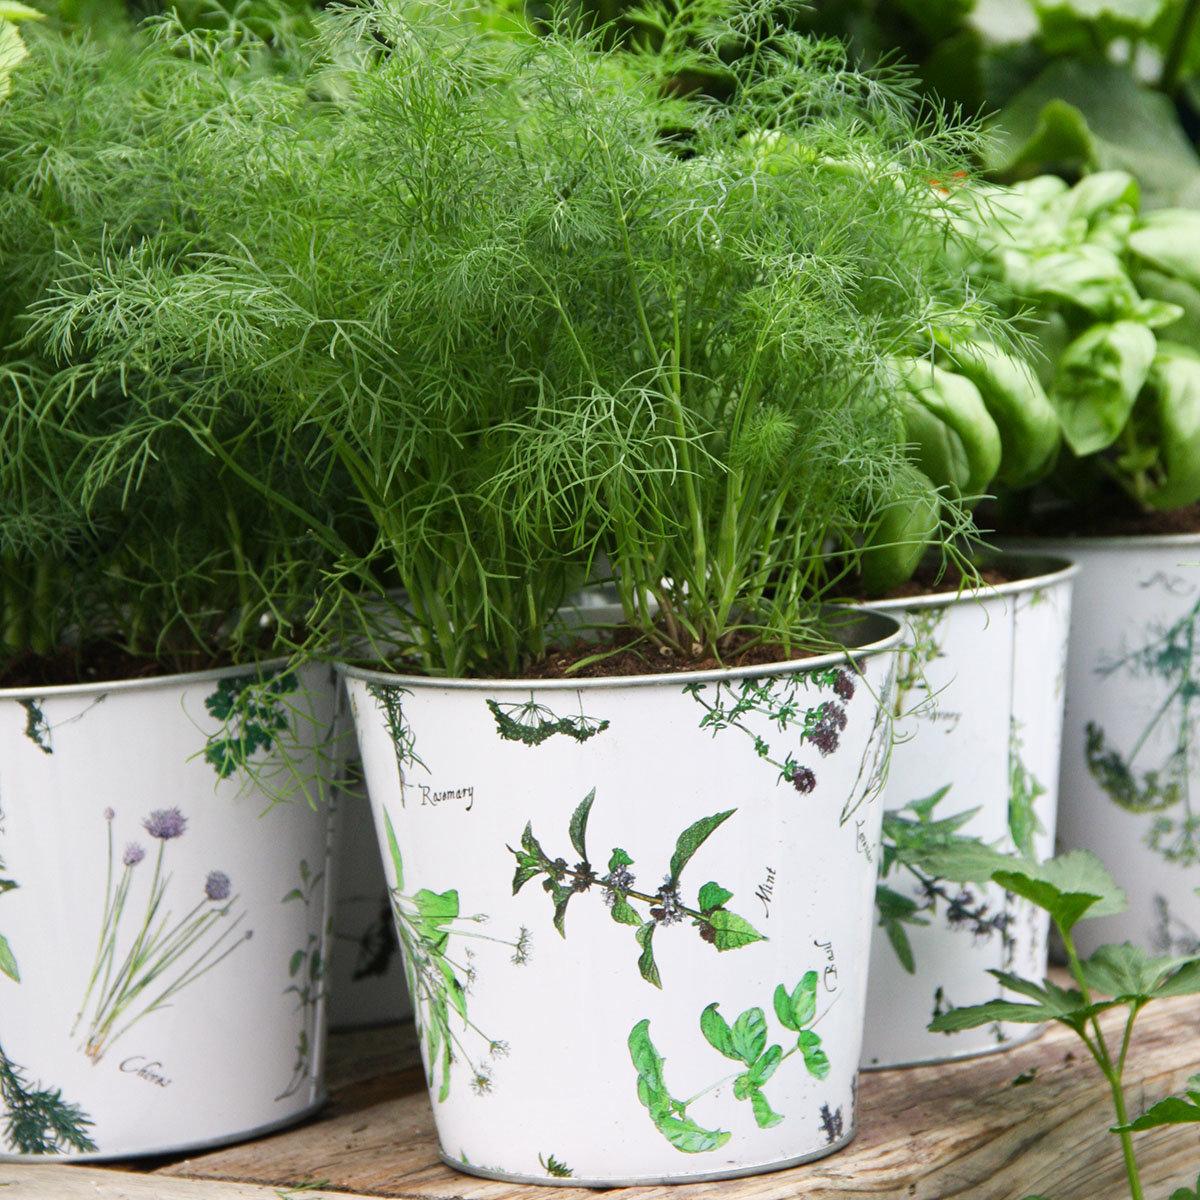 Garten- und Topf-Dill